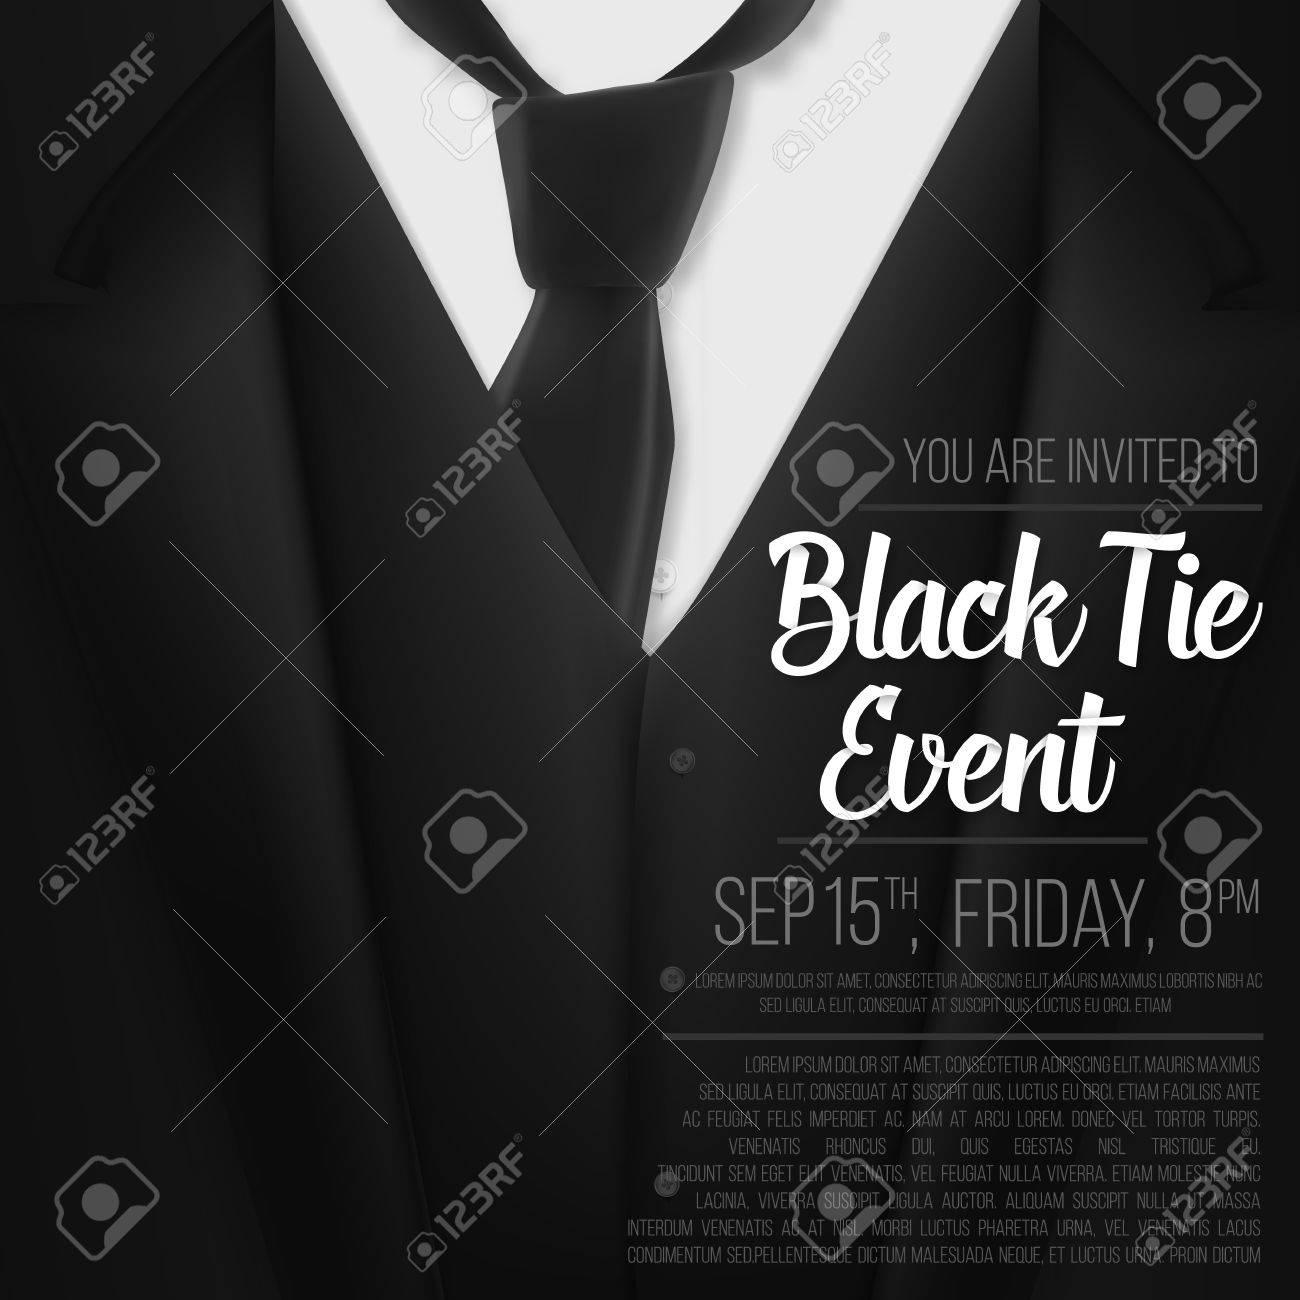 0440999f2d0a Illustration of Black Suit. Black Tie Event Invitation Template. Realistic  tor 3D Man Suit